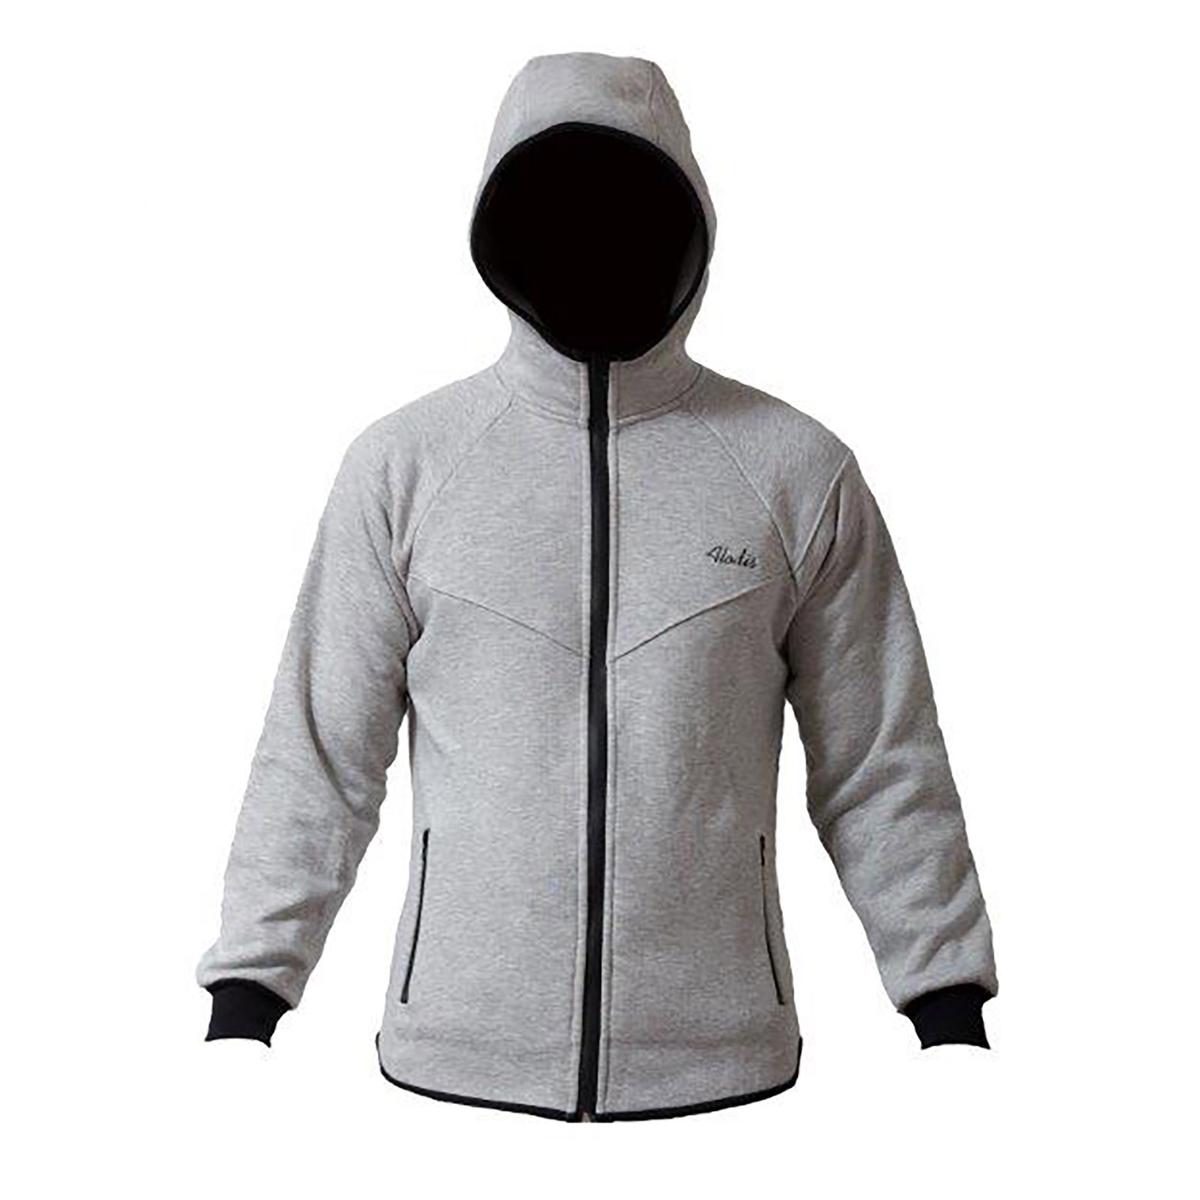 56f41faf Buy hh hustad jakke herre grå. Shop every store on the internet via ...